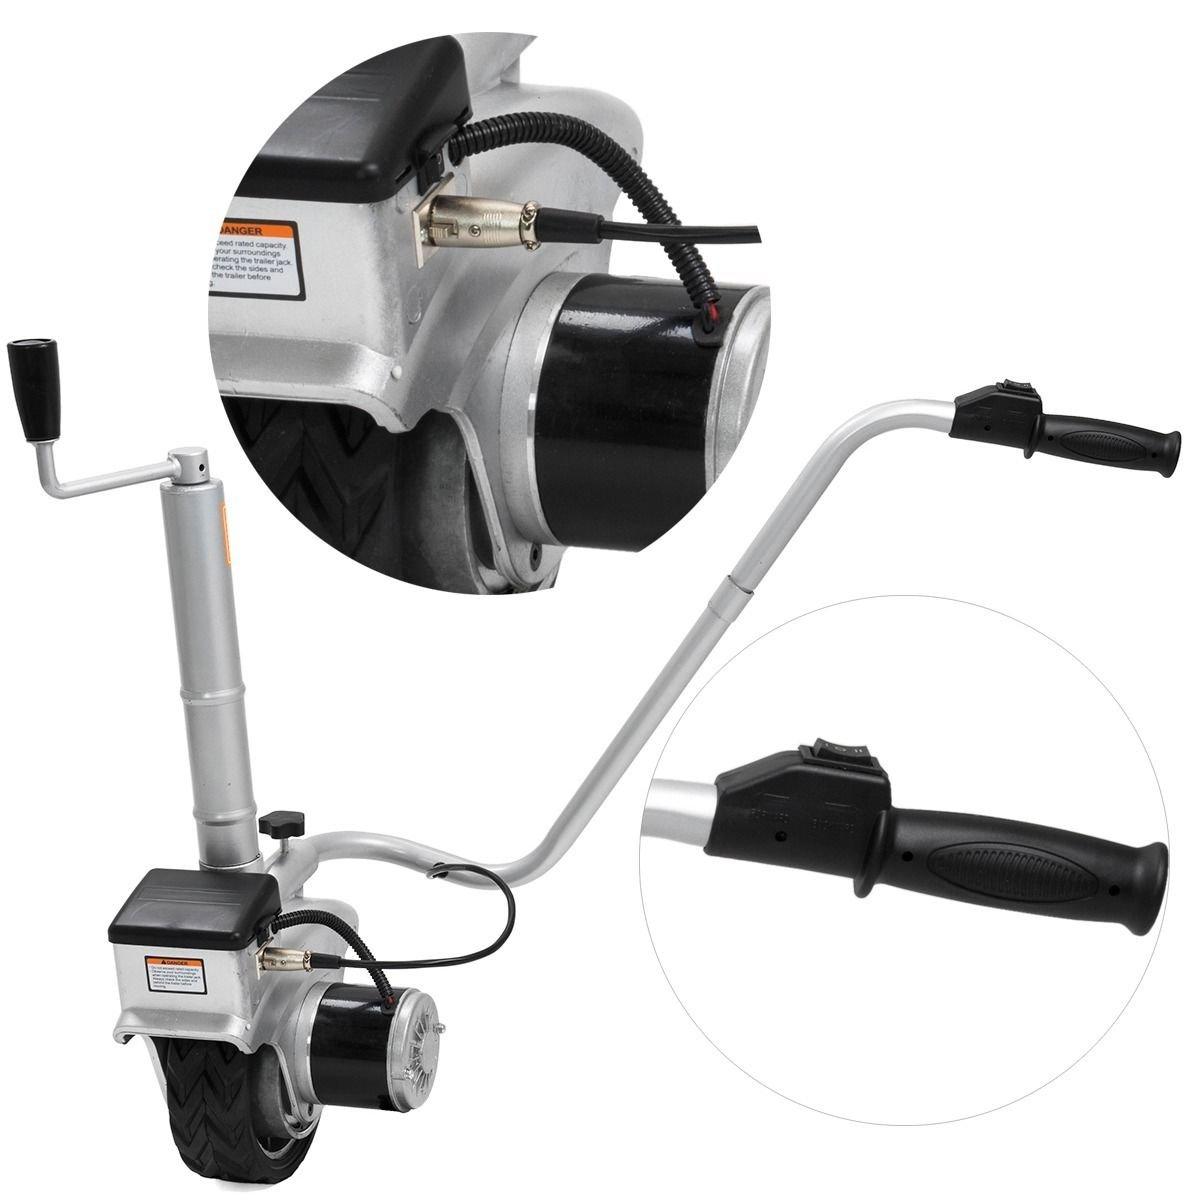 New 12V Electric Mini Mover Jockey Wheel Caravan Boat Trailer Camper jack stands